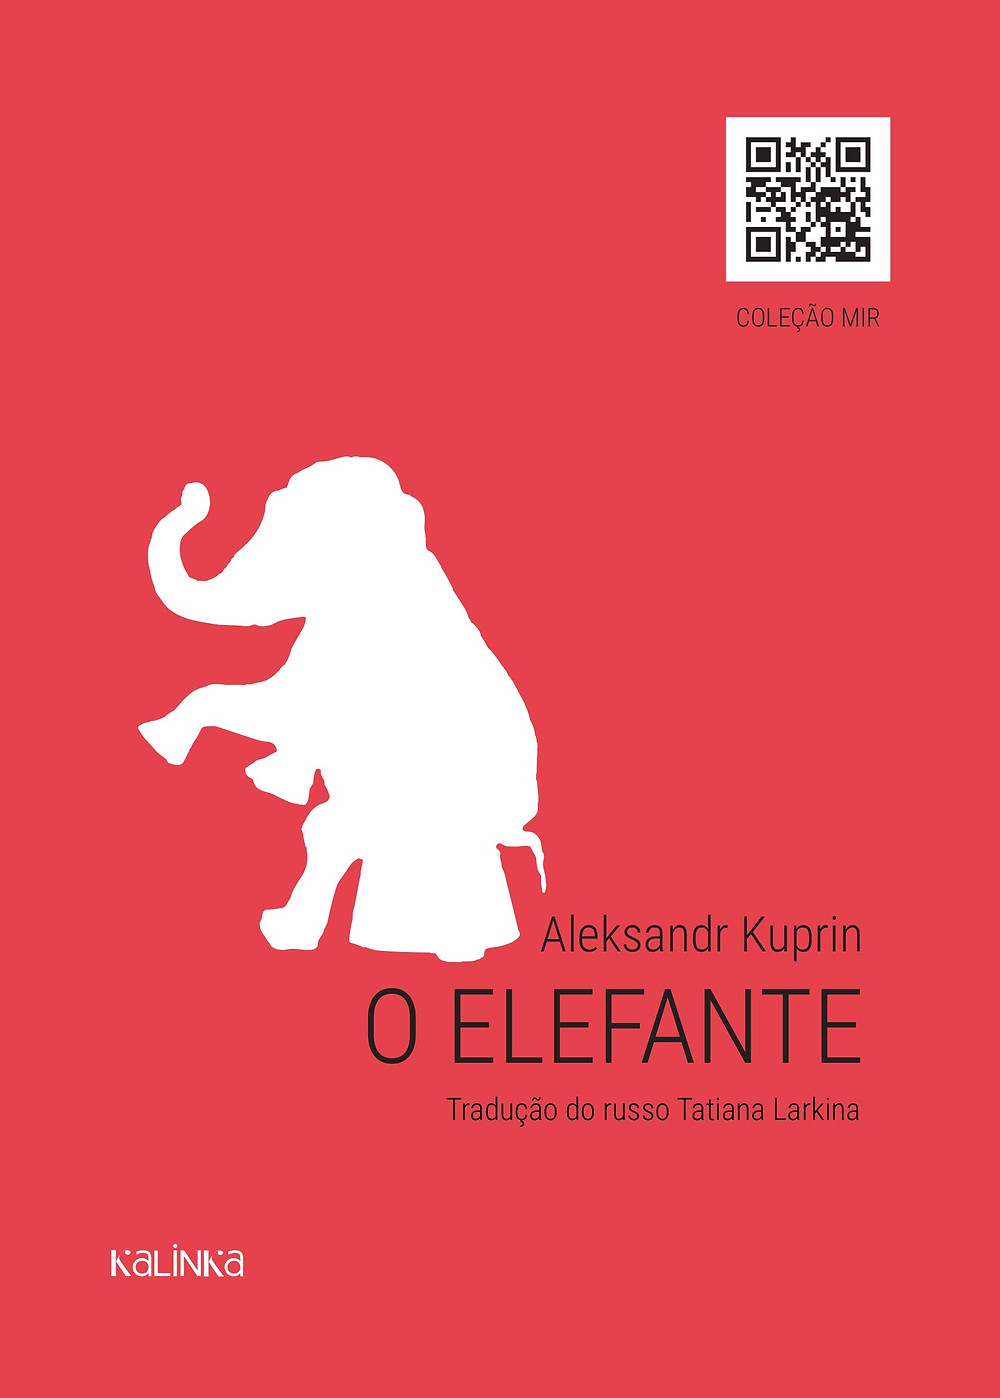 O Elefante de Aleksandr Kuprin